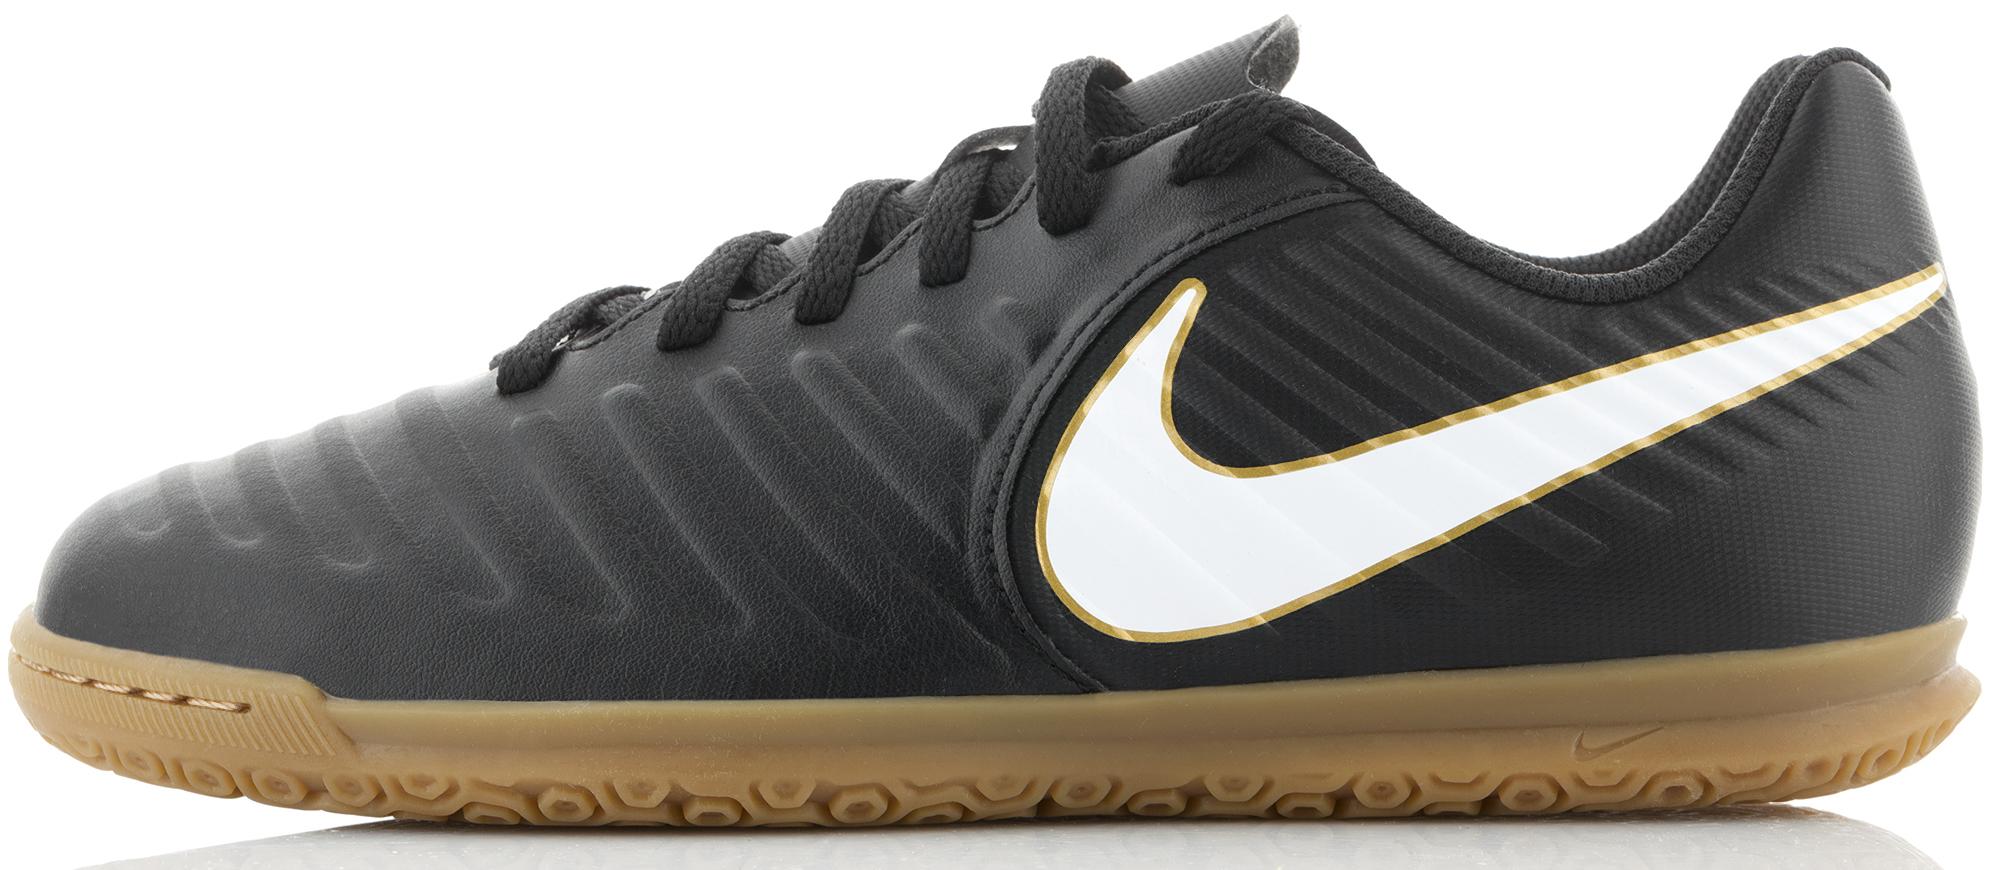 Nike Бутсы для мальчиков Nike TiempoX Rio IV IC бутсы зальные nike nike ni464abufh40